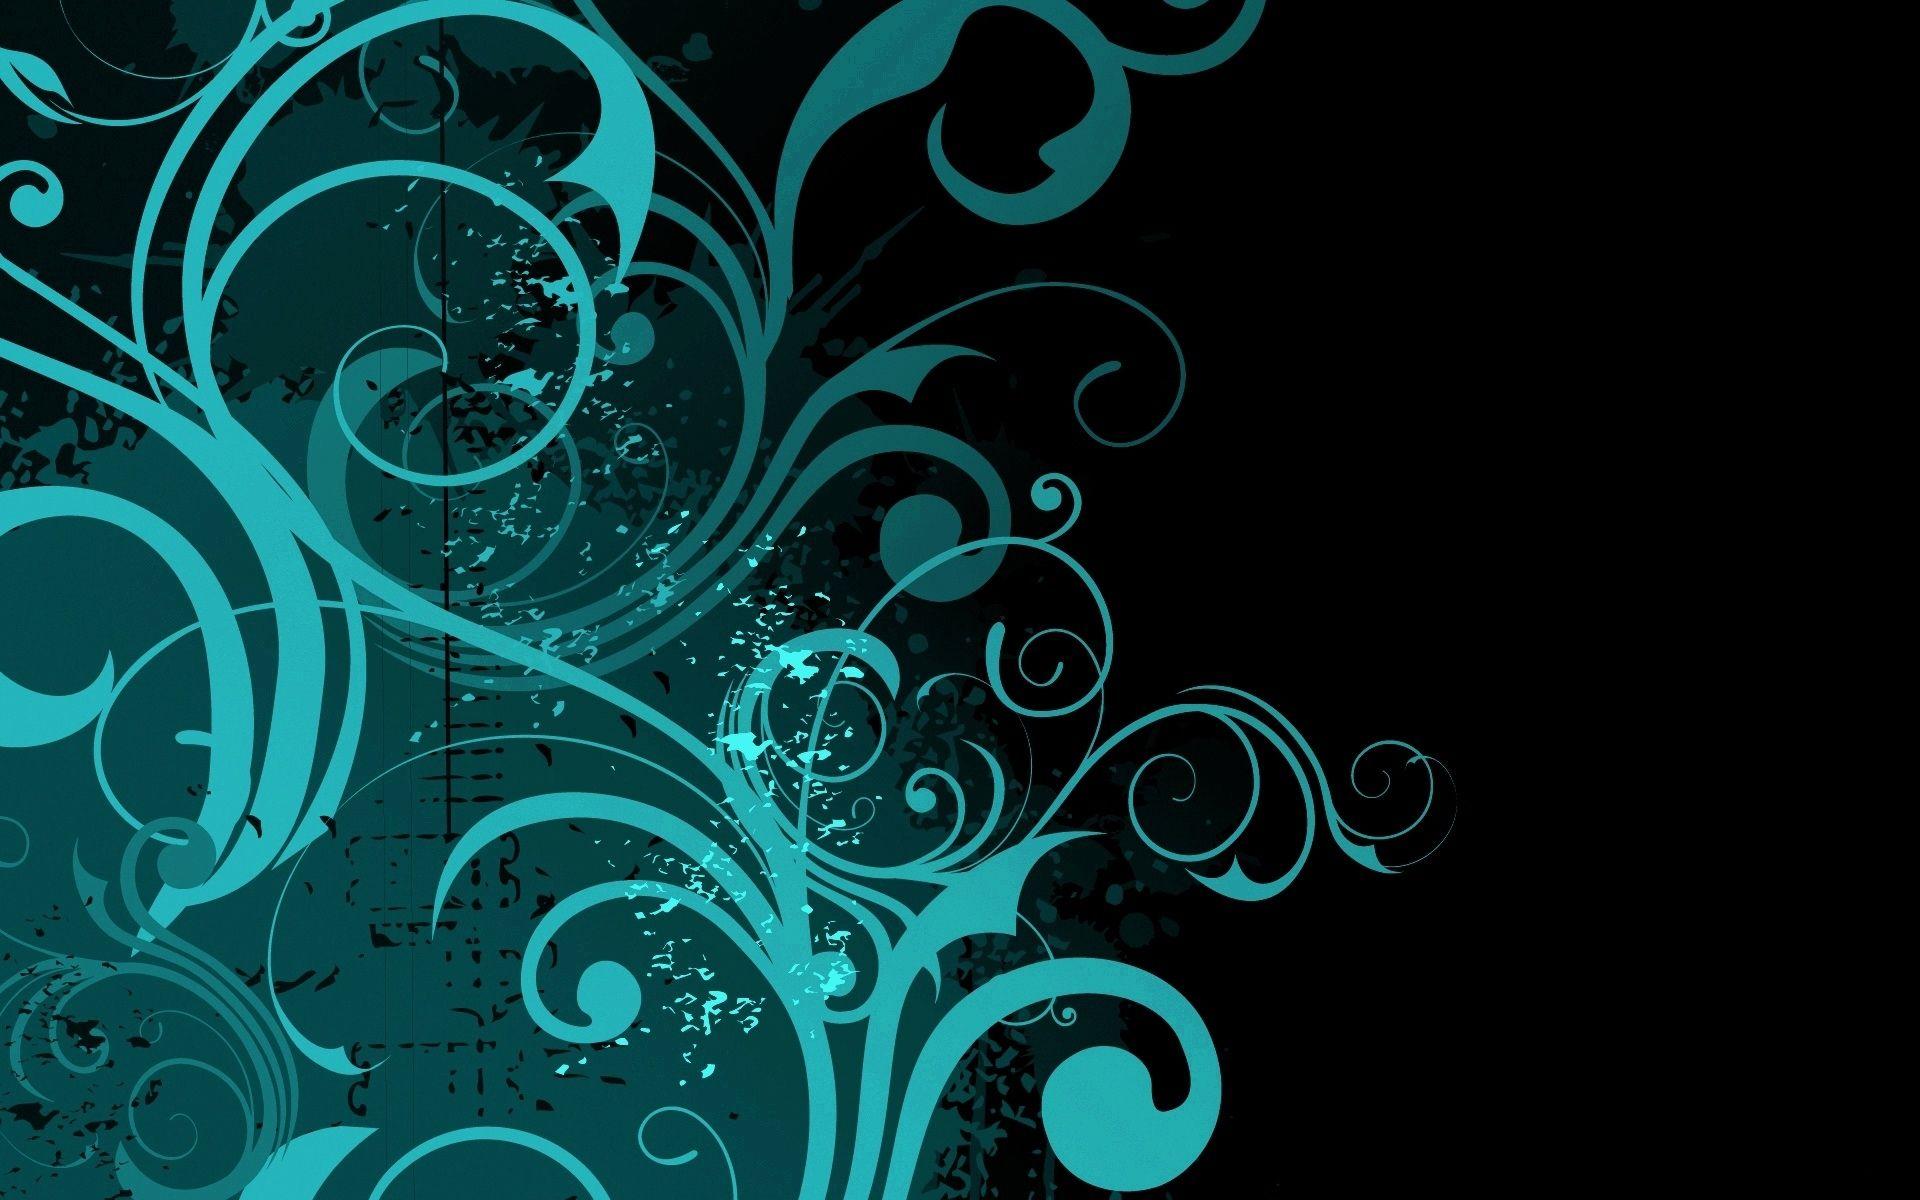 Cool Abstract Flower Wallpaper Hd